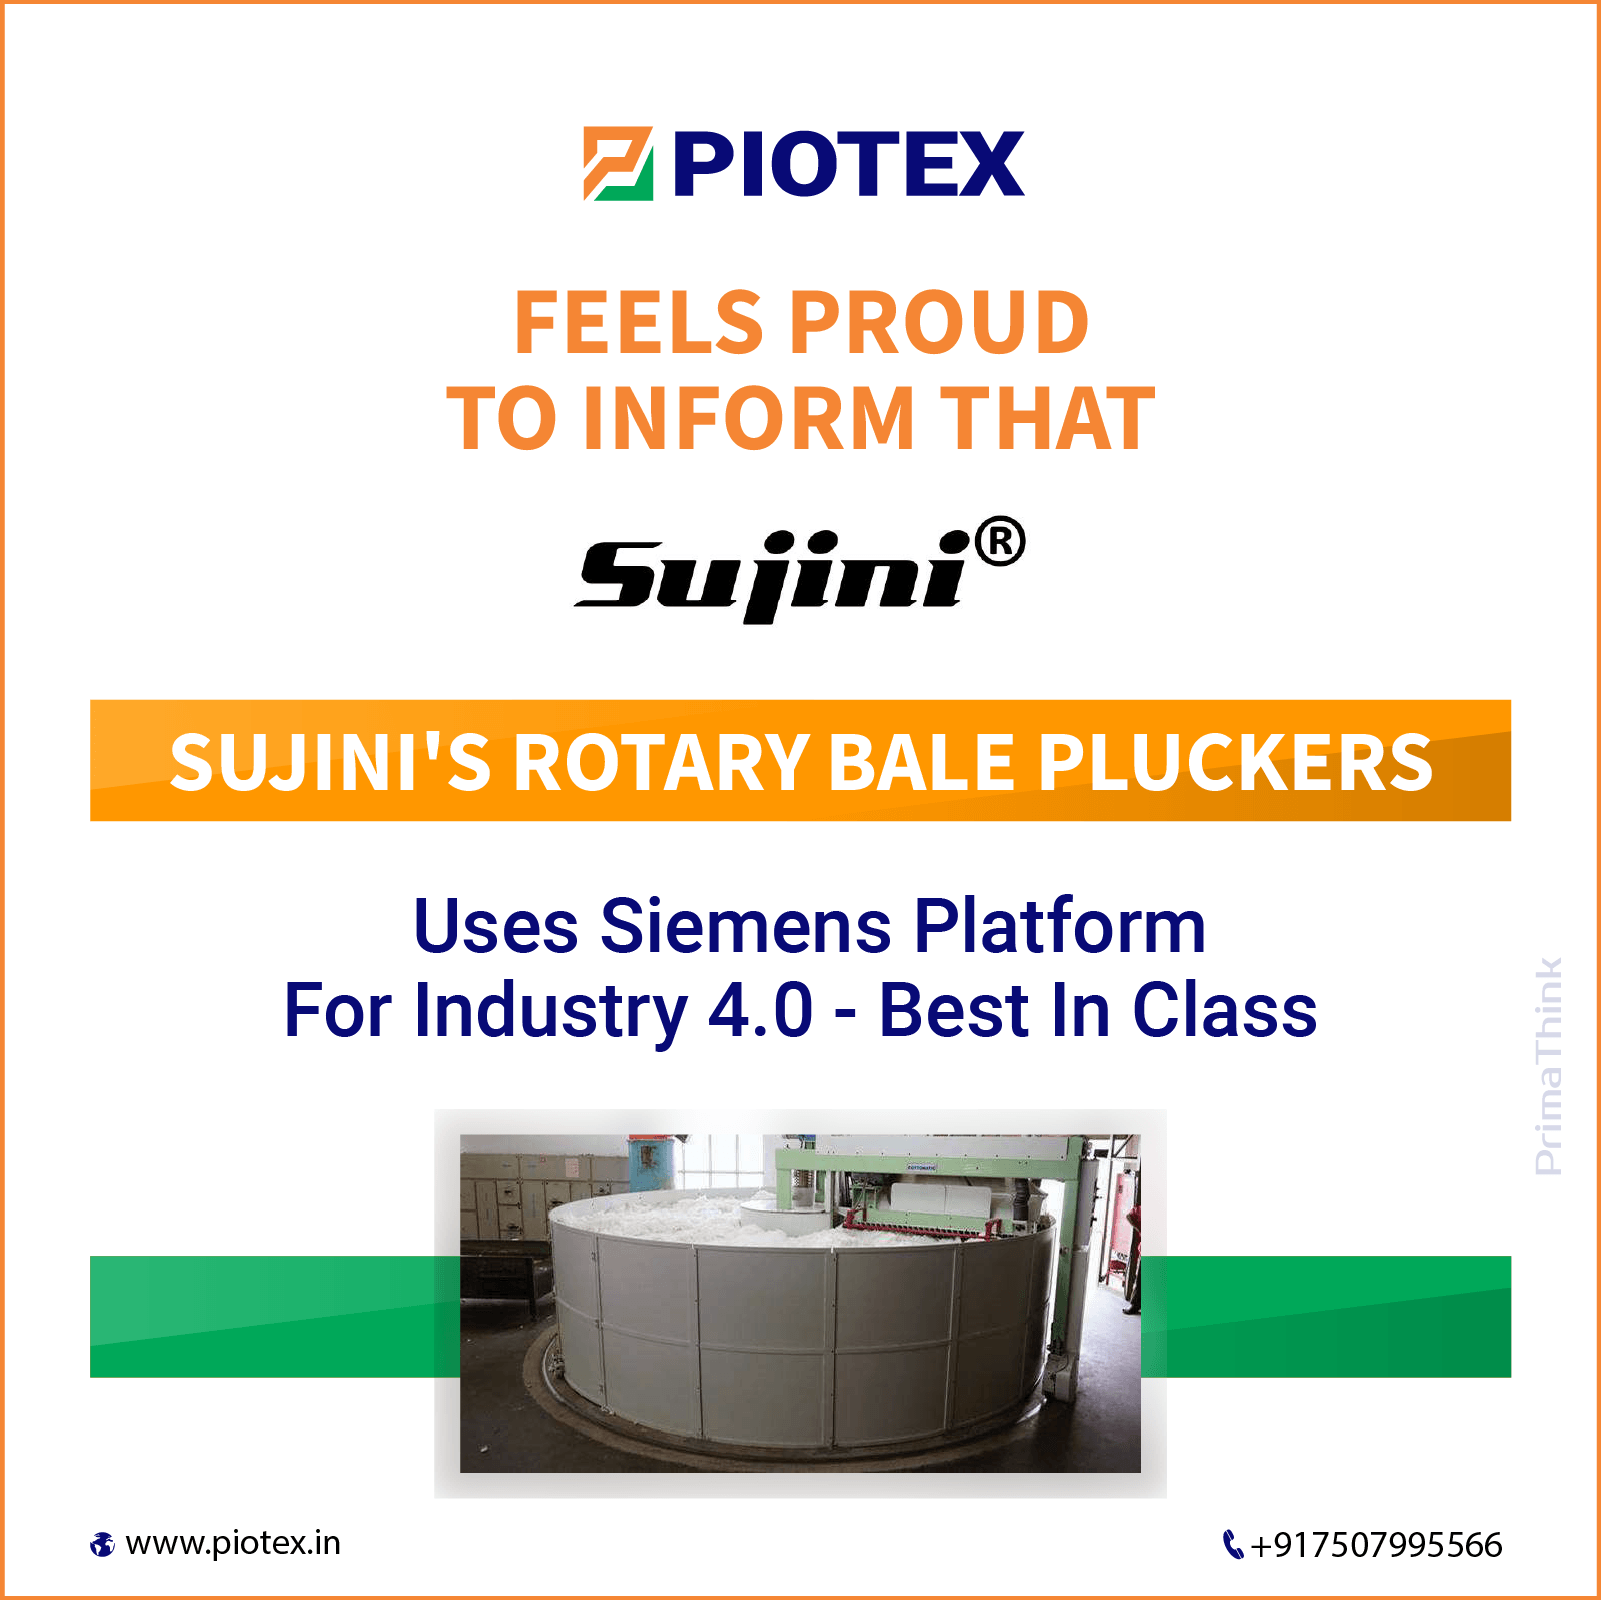 Sujini Rotary Bale Pluckers uses Siemens Platform for Industry 4.0